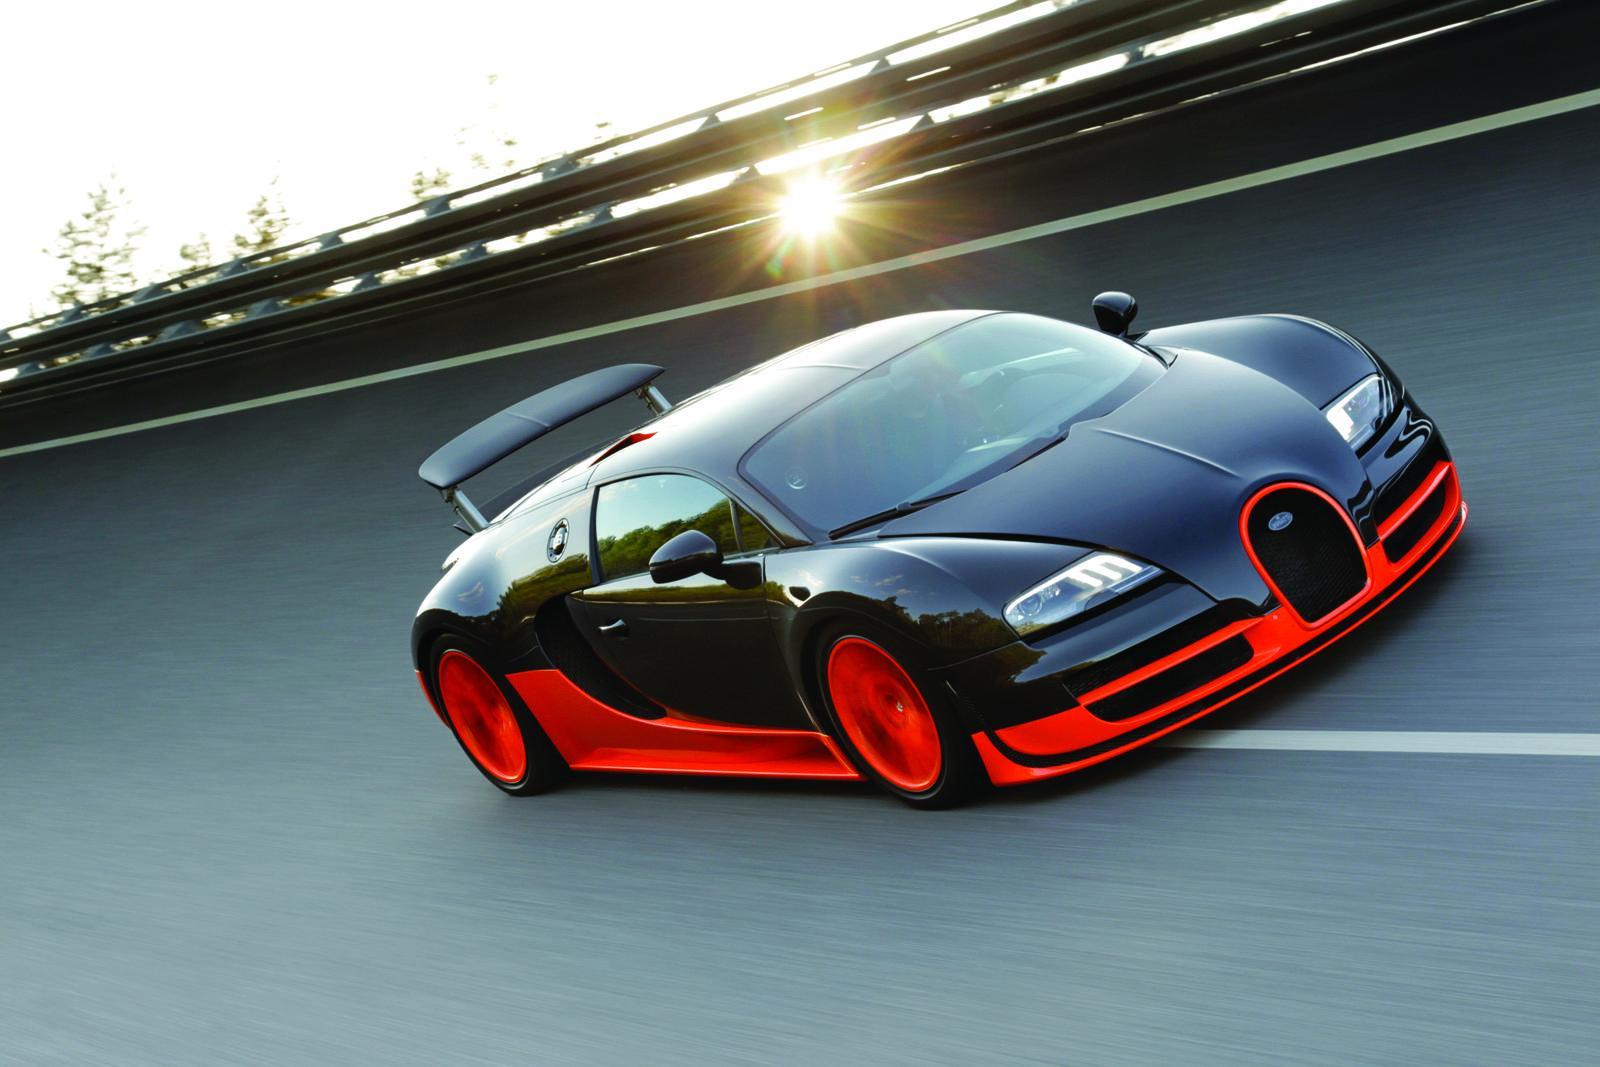 bugatti veyron super sport perde o estatuto de carro de. Black Bedroom Furniture Sets. Home Design Ideas